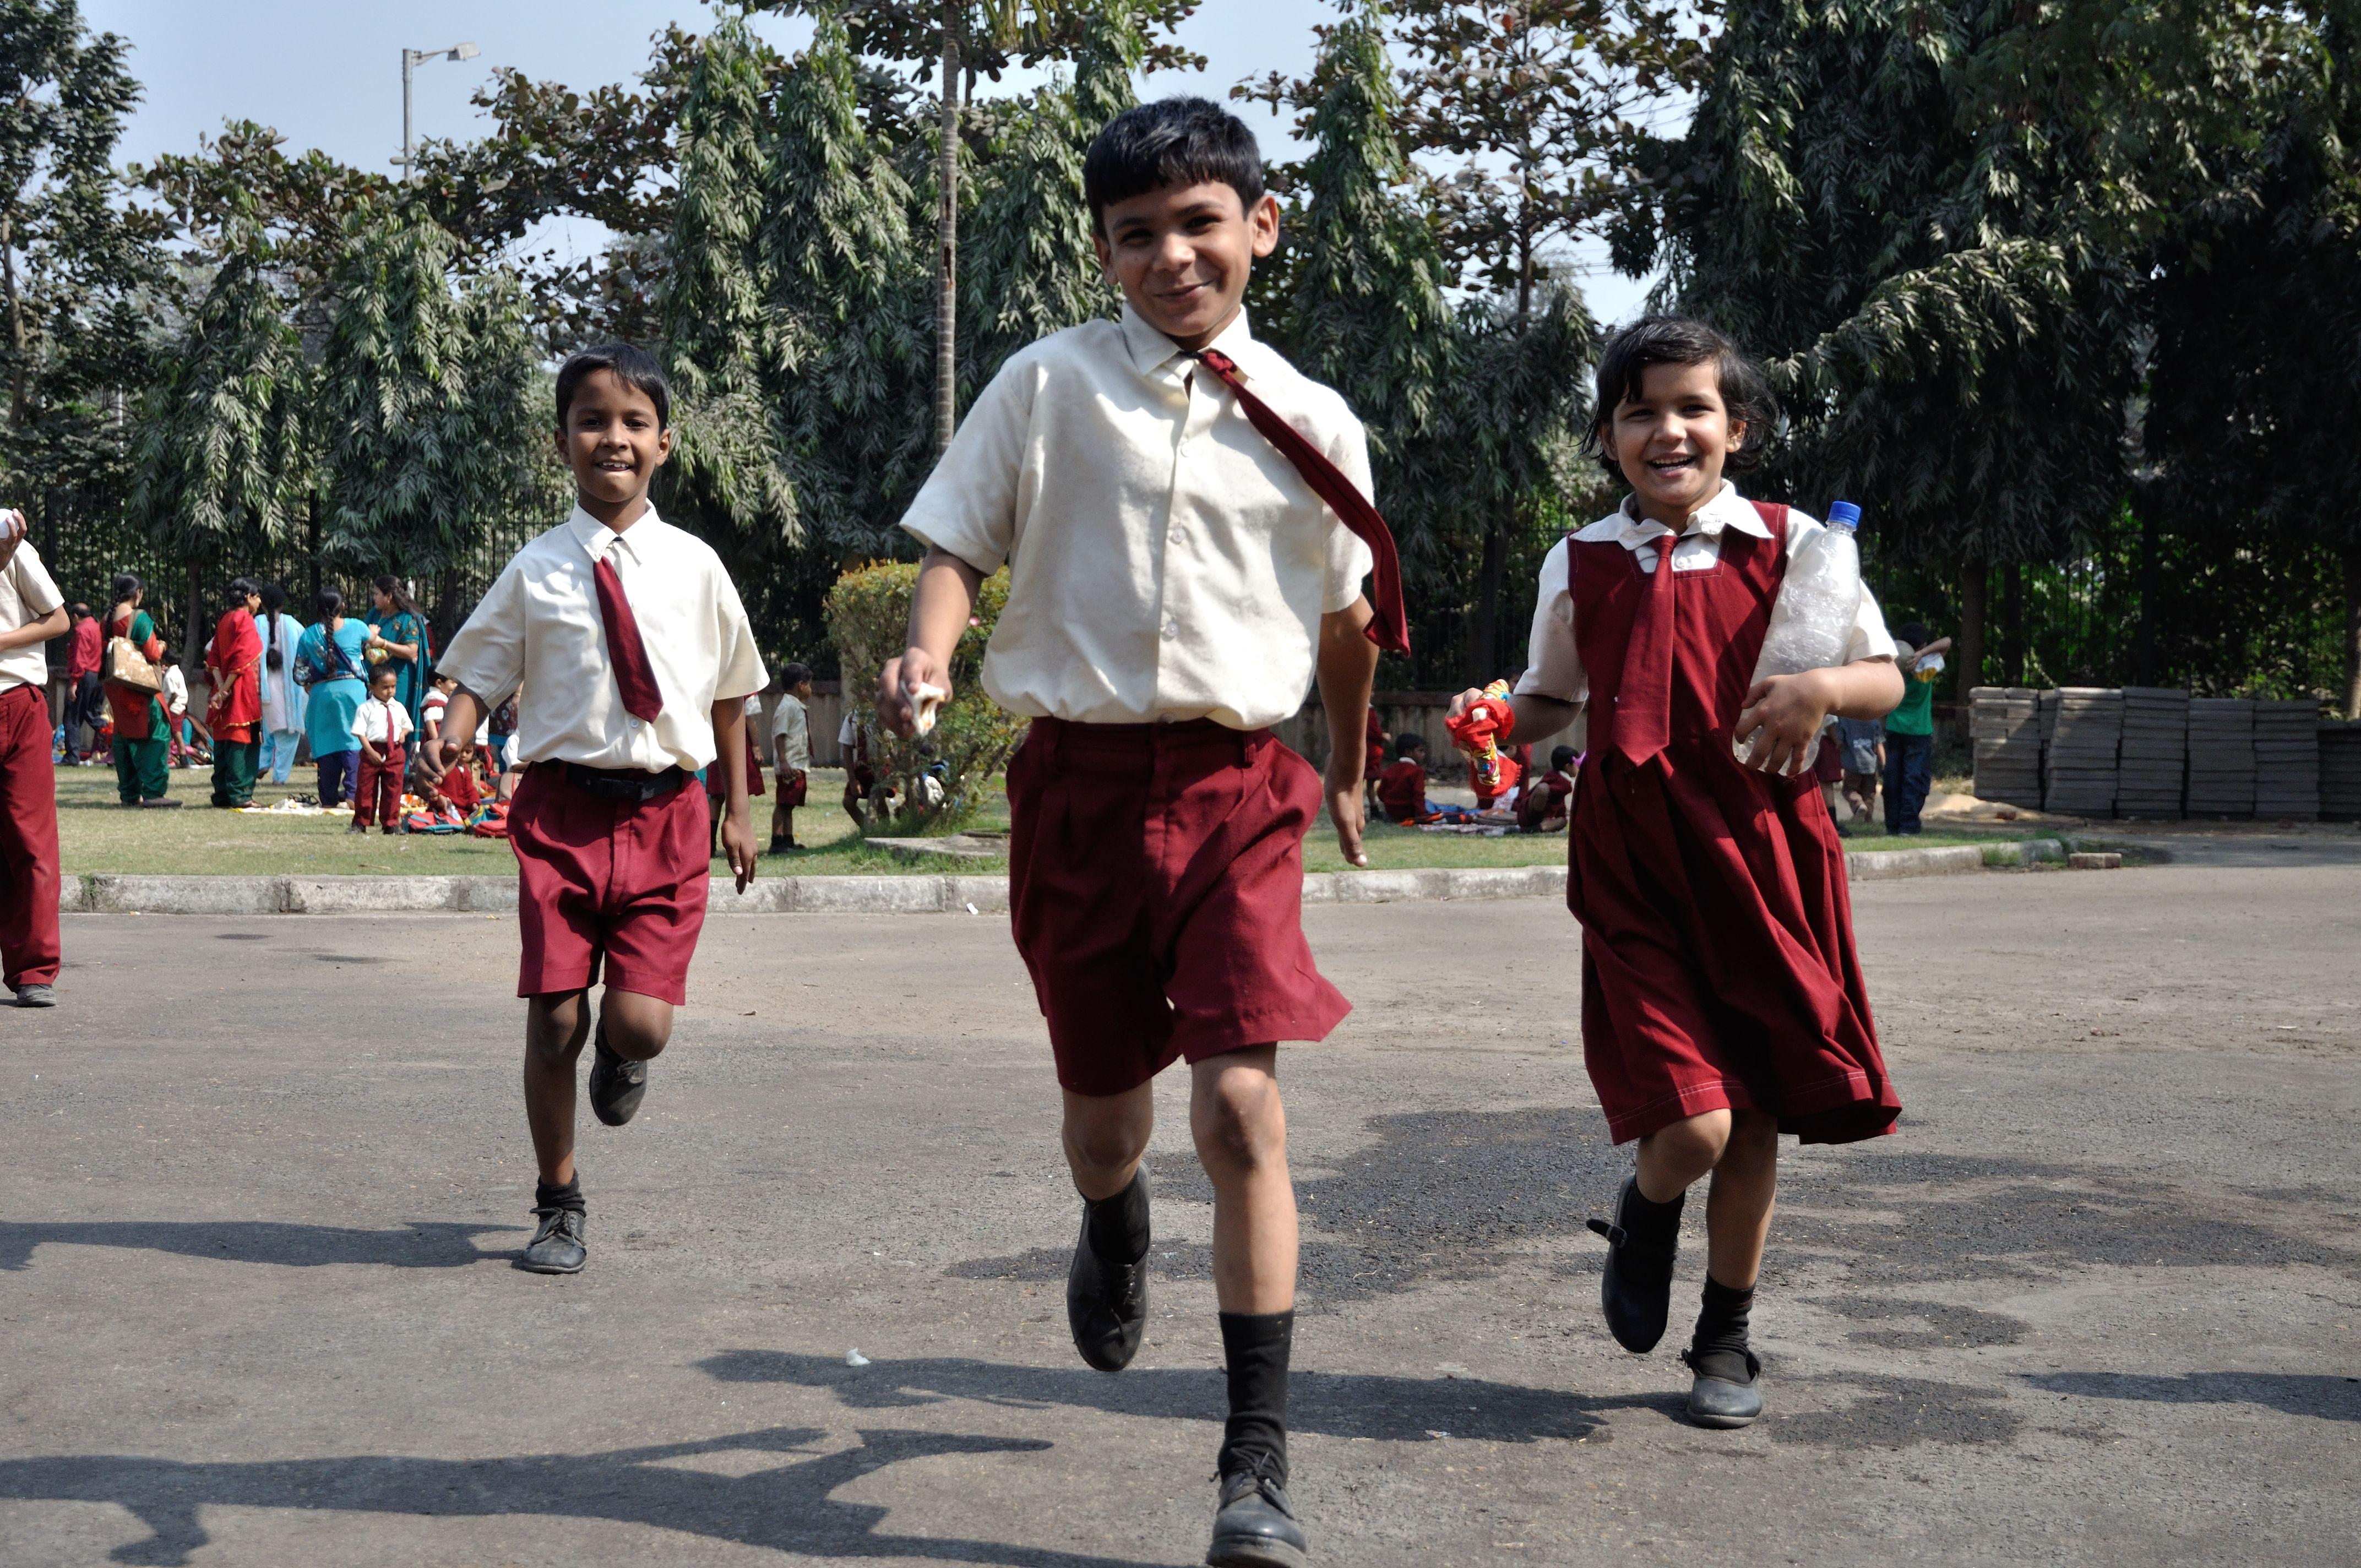 Playful_Schoolchildren_-_Science_City_-_Kolkata_2011-01-28_0295